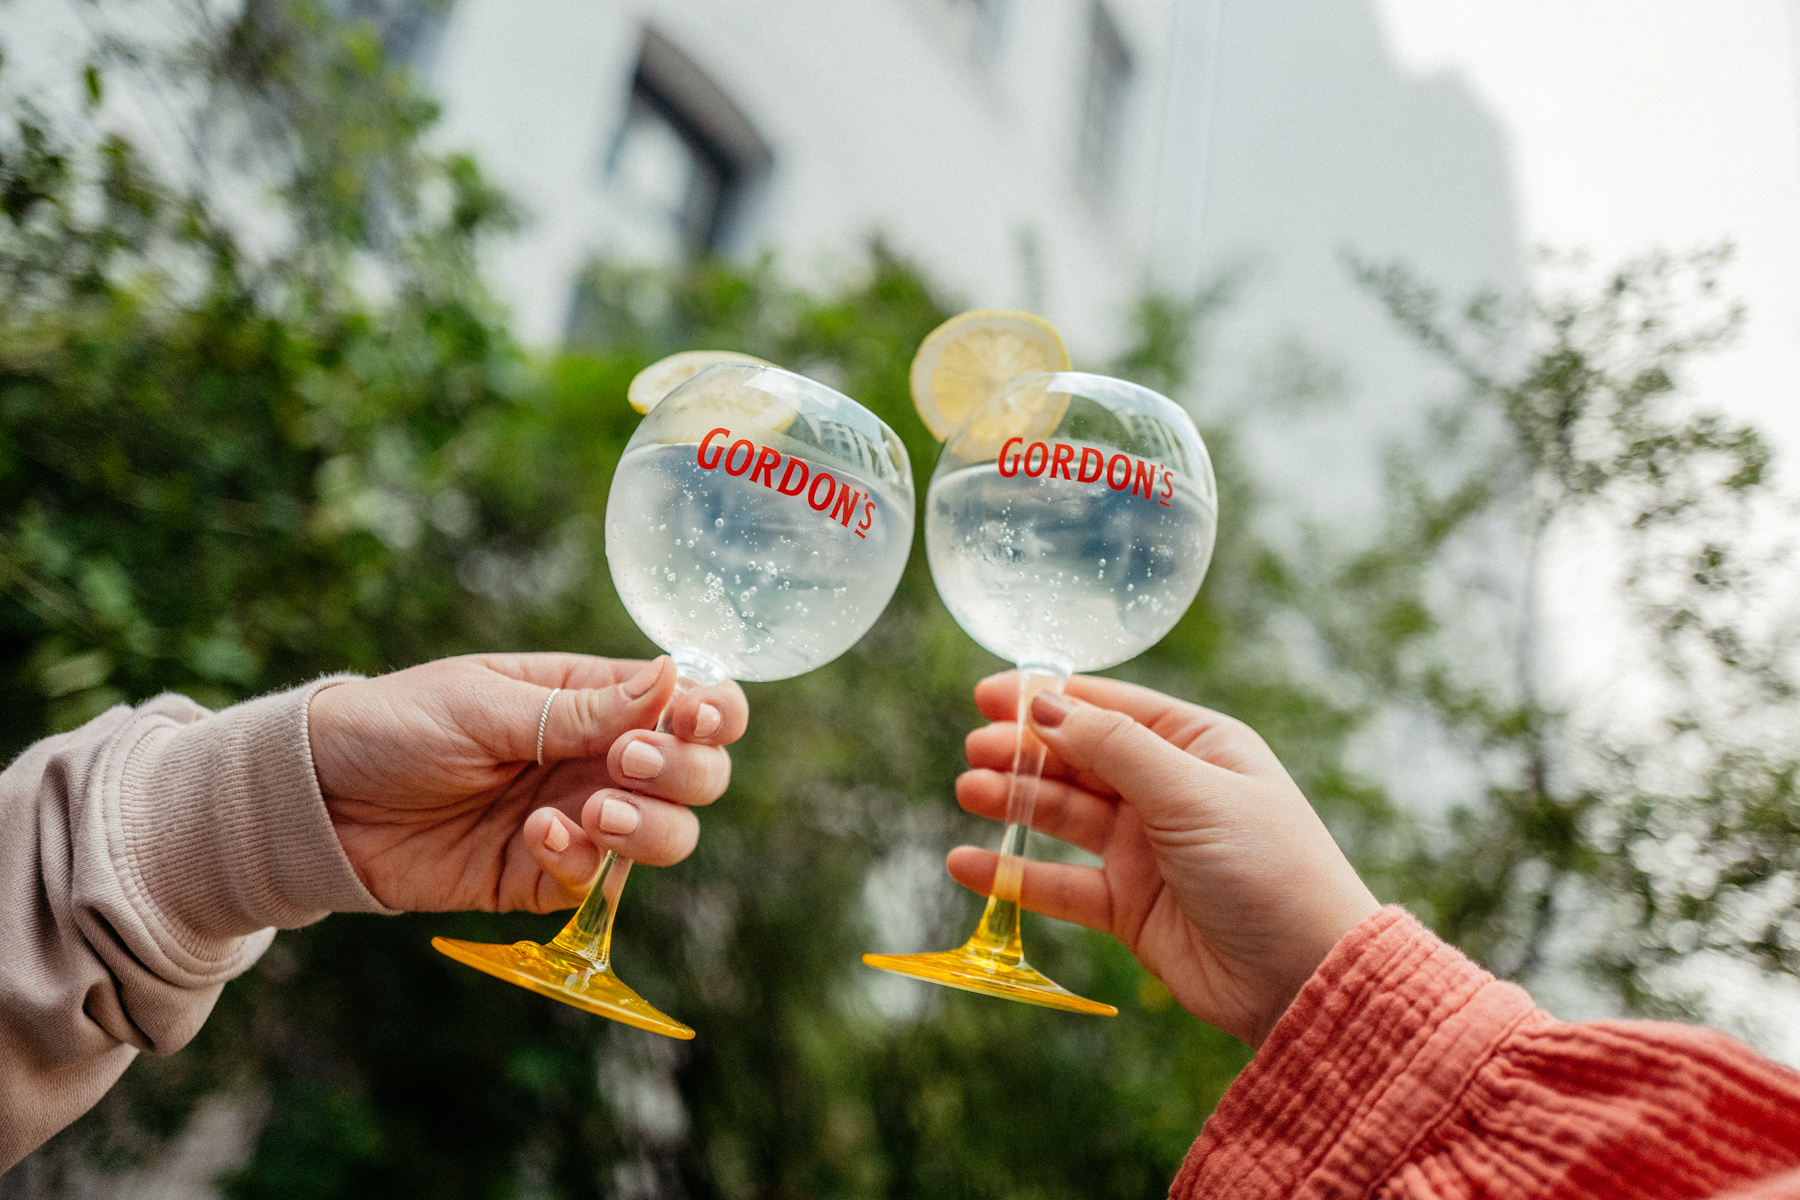 Geheimtipp Hamburg Gordons Gin Sicilian Lemon Dahlina Sophie Kock 044